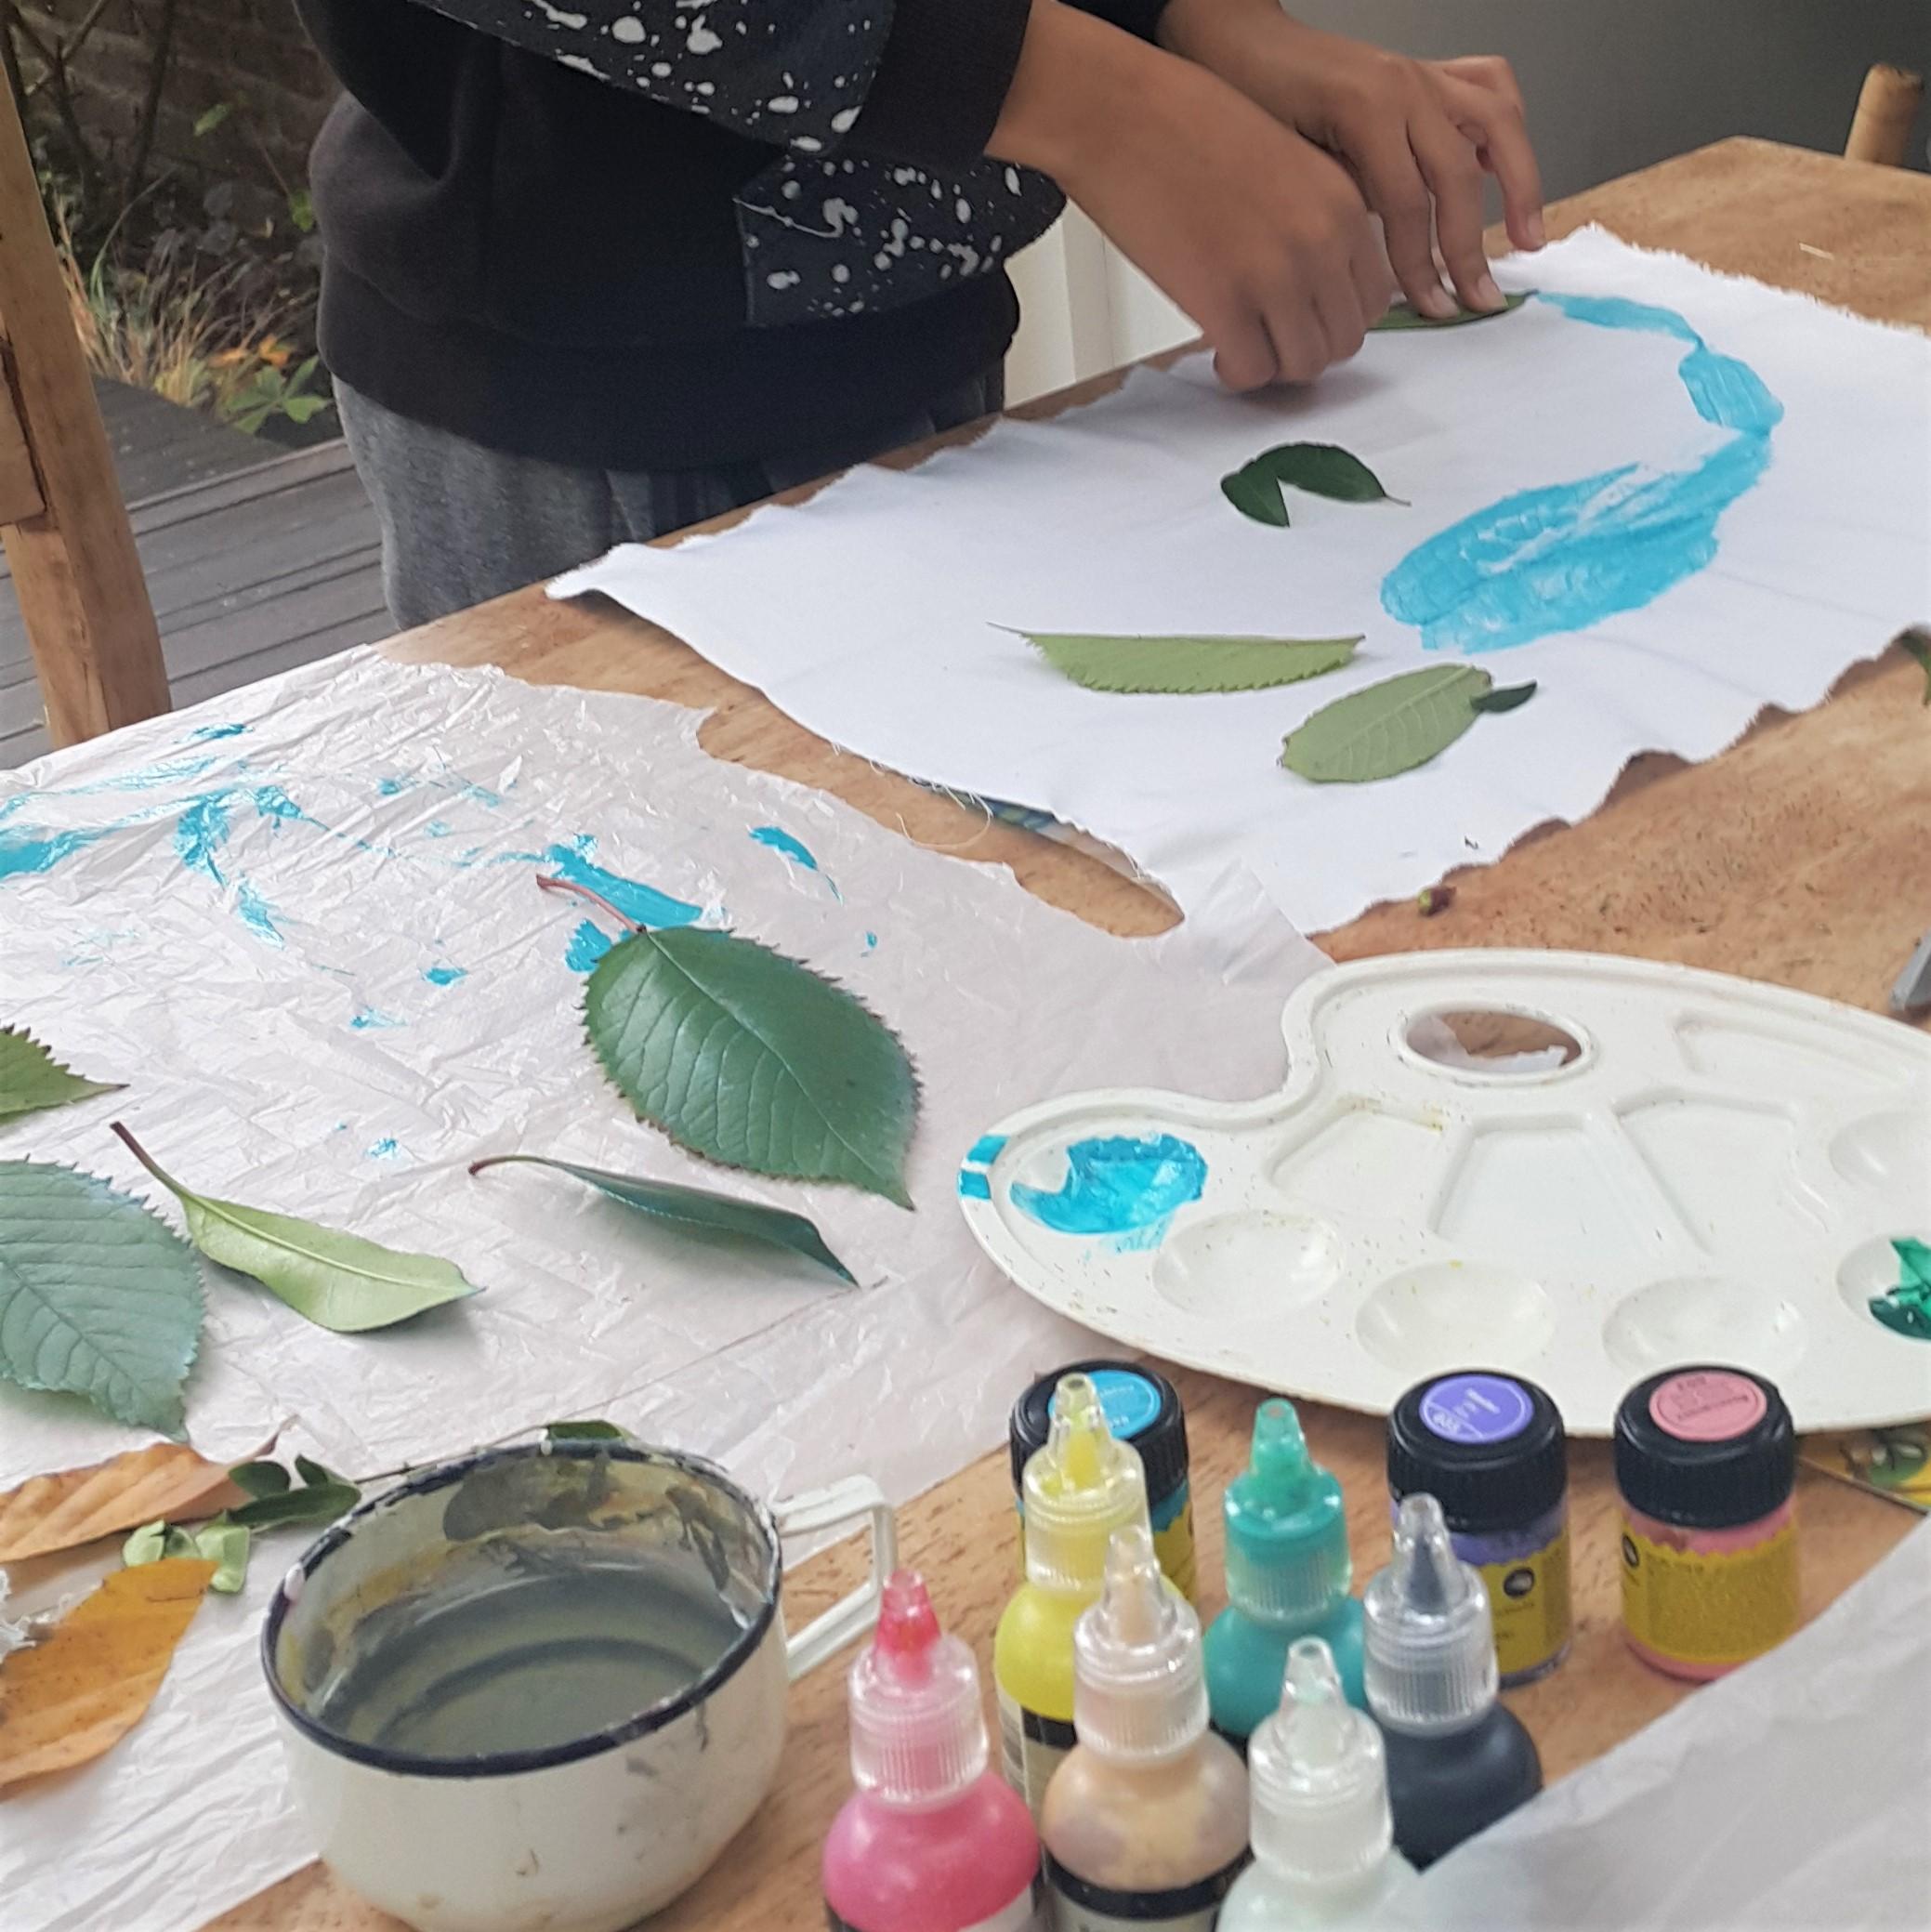 printing-technique-fabric-paint-year8-private-art-lesson-irina-taneva-tutor